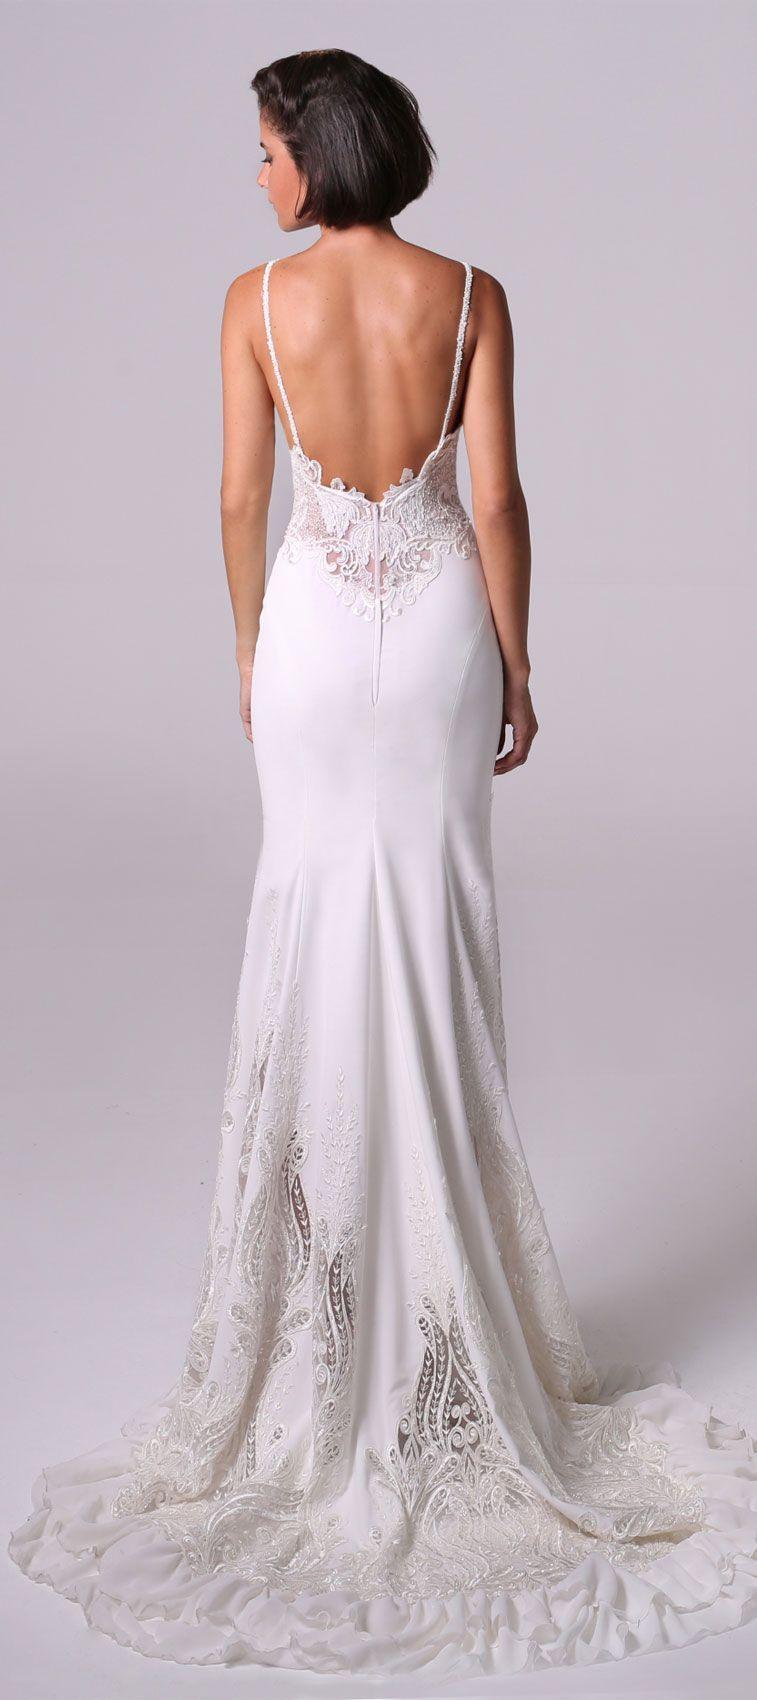 Michal medina wedding dresses wedding dress mermaid gown and